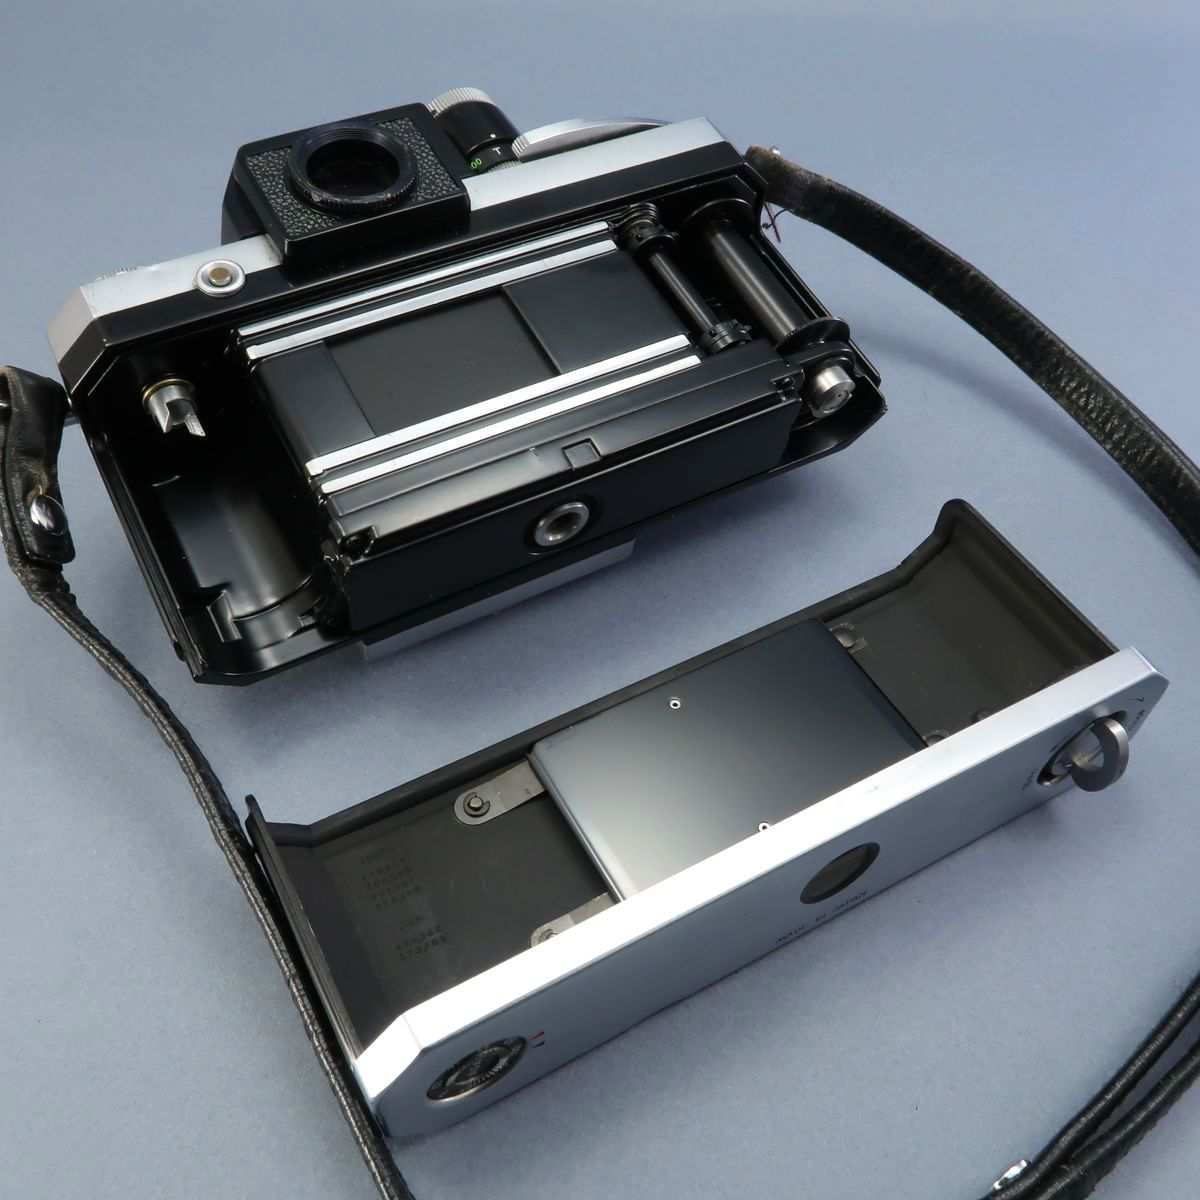 ★Nikon F フィルムカメラ 本体 レンズ Nikkor-Auto 105mm F 2.5 28mm F 3.5 NIKKOR-H Auto 1:3.5 f=2.8cm FTN 付属多数 ジャンク_画像6